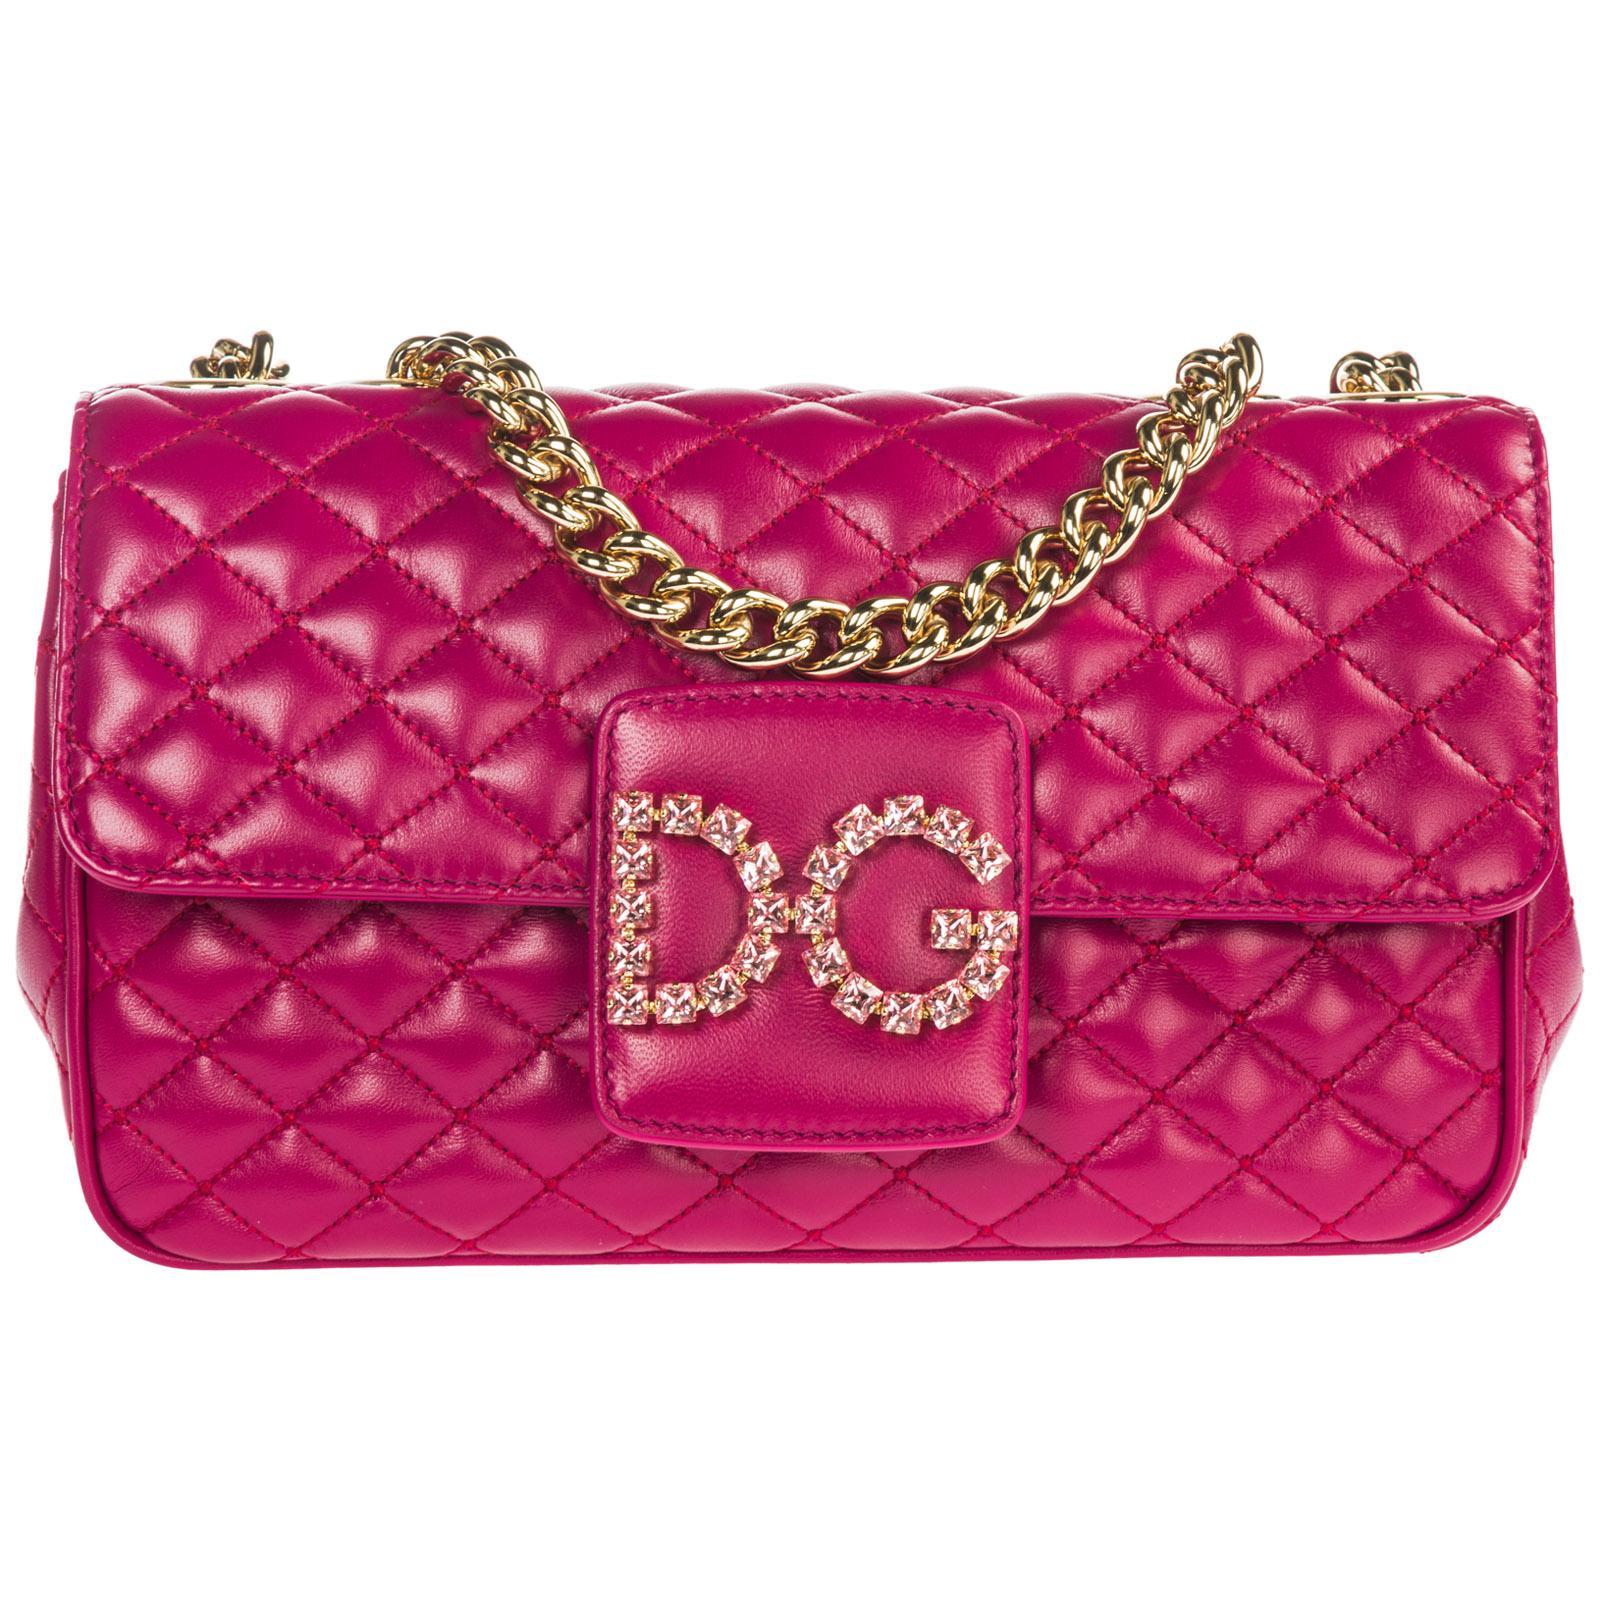 Lyst - Dolce   Gabbana Leather Shoulder Bag Dg Millennials in Pink 546a98ca0e9d0